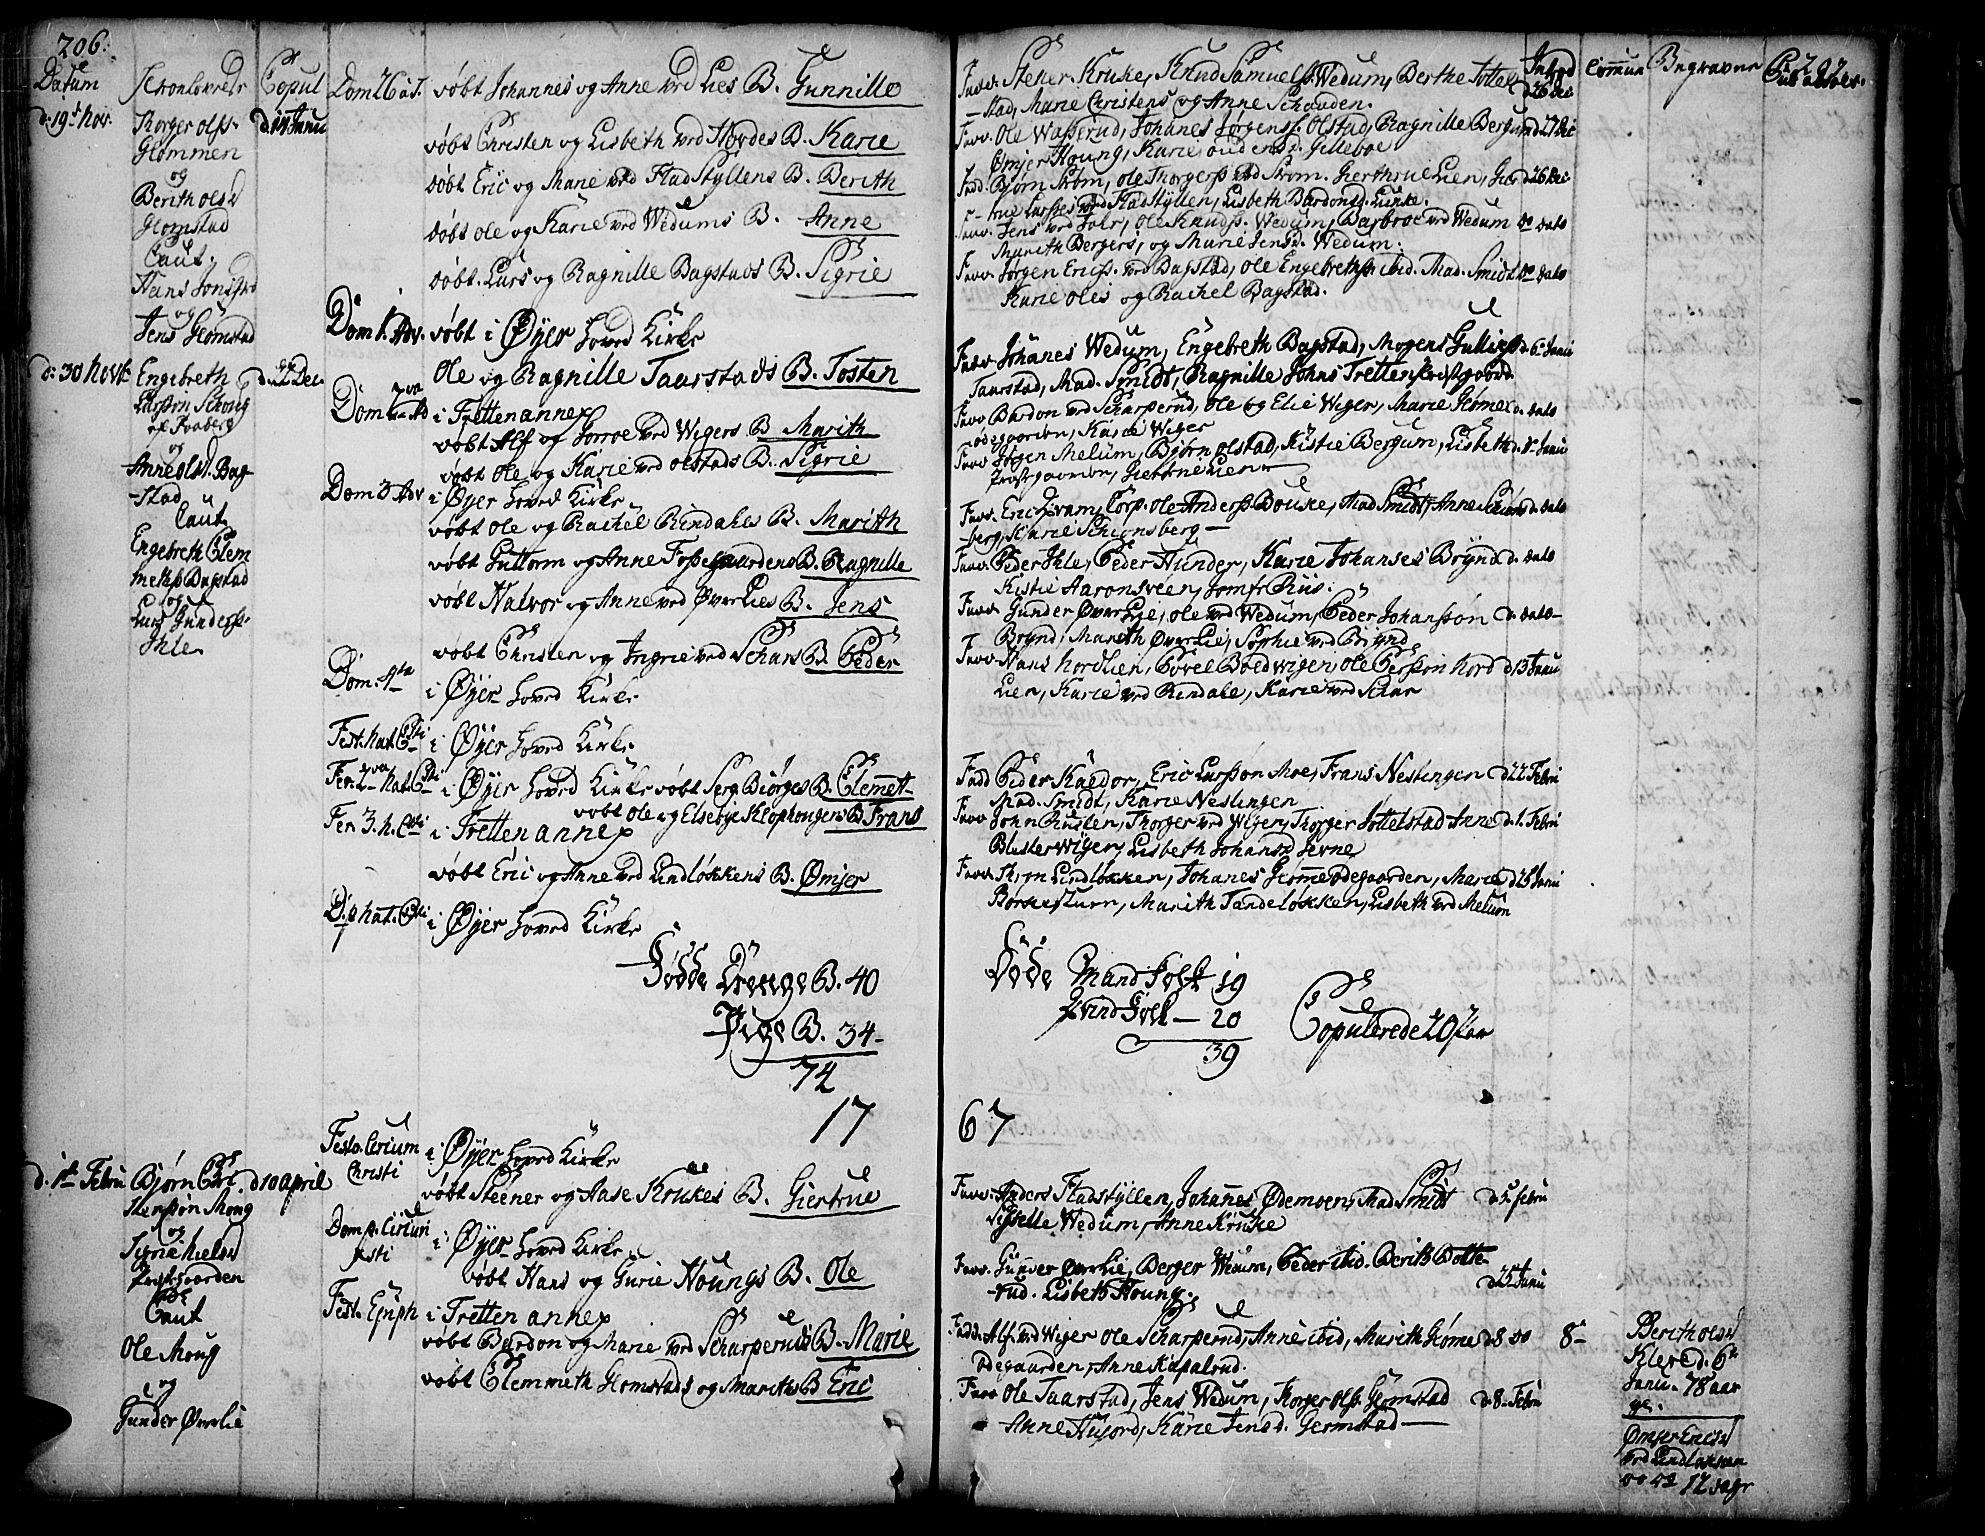 SAH, Øyer prestekontor, Ministerialbok nr. 2, 1733-1784, s. 206-207